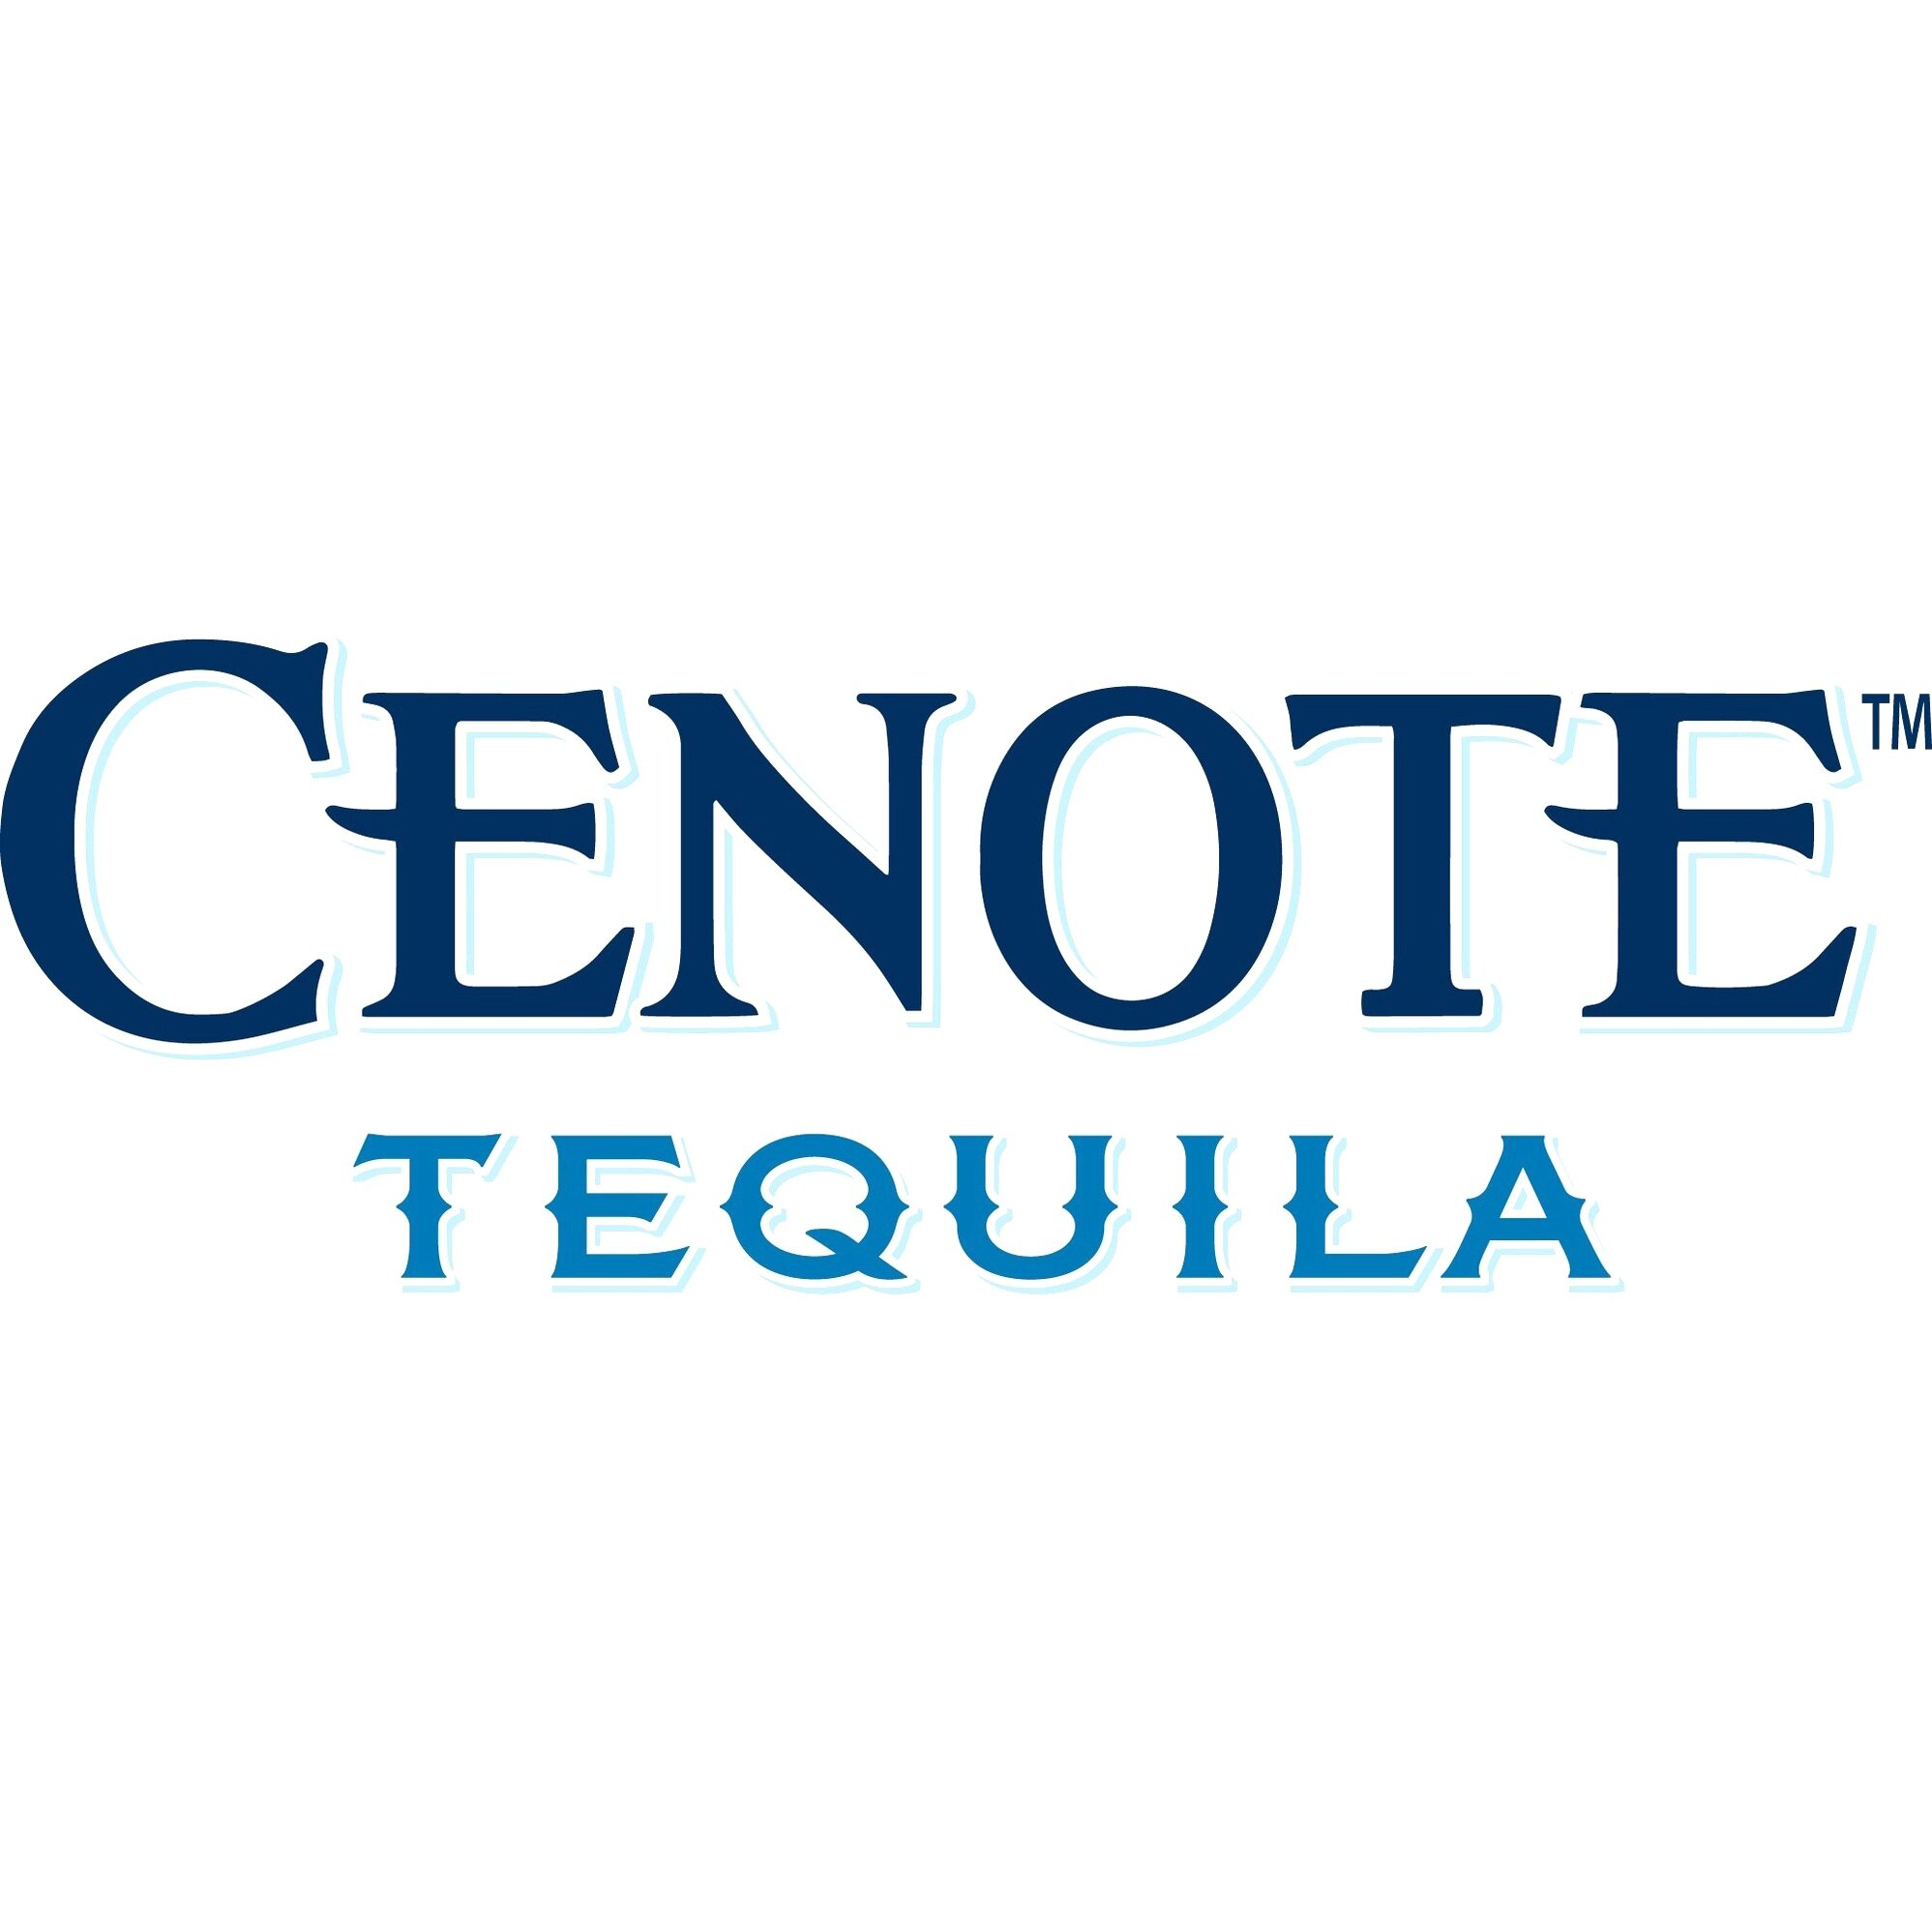 Cenote Tequila Logo.jpg